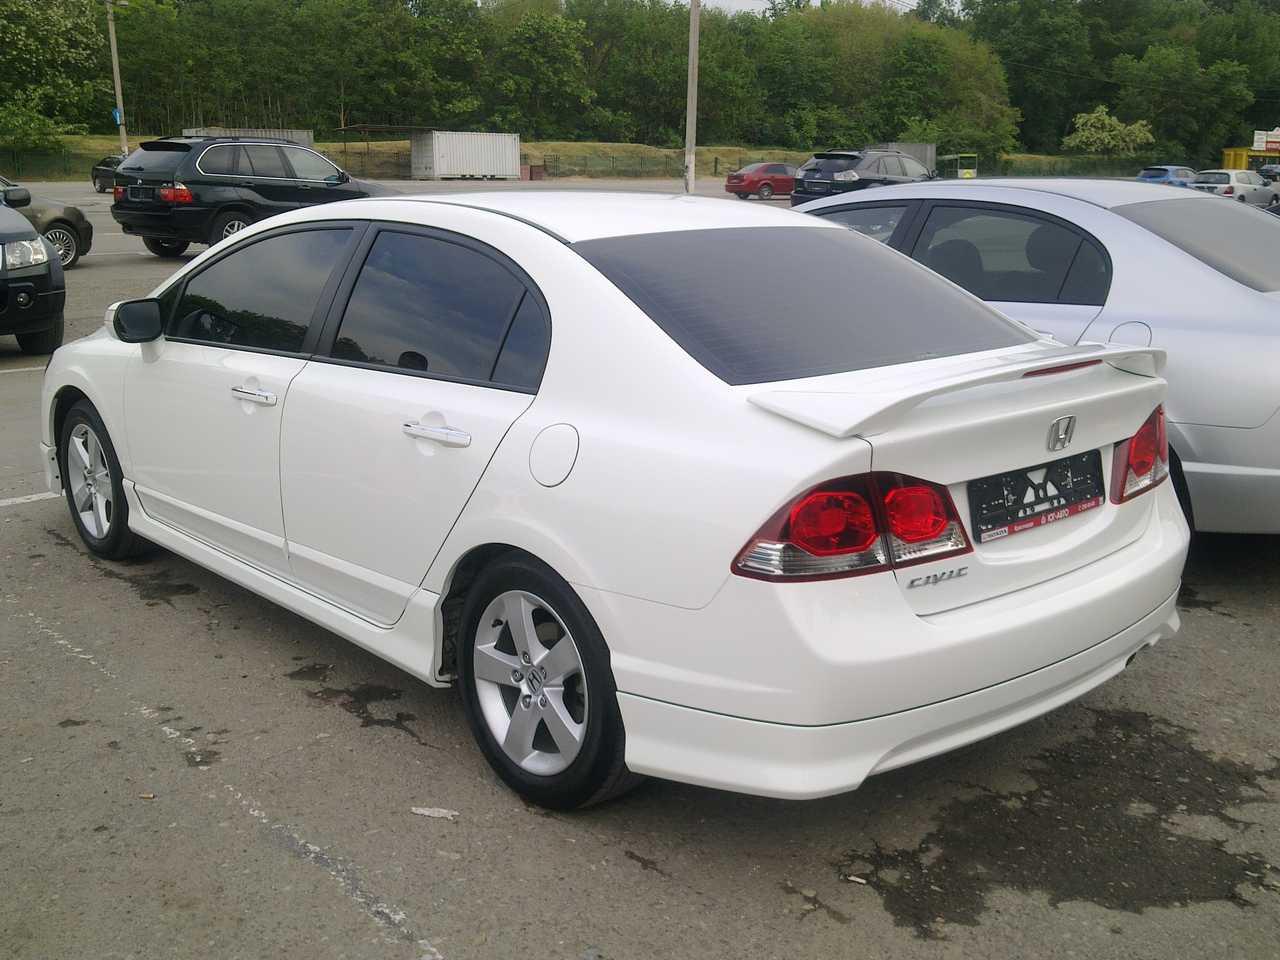 2009 Honda Civic Pictures, 1.8l., Gasoline, FF, Automatic For Sale